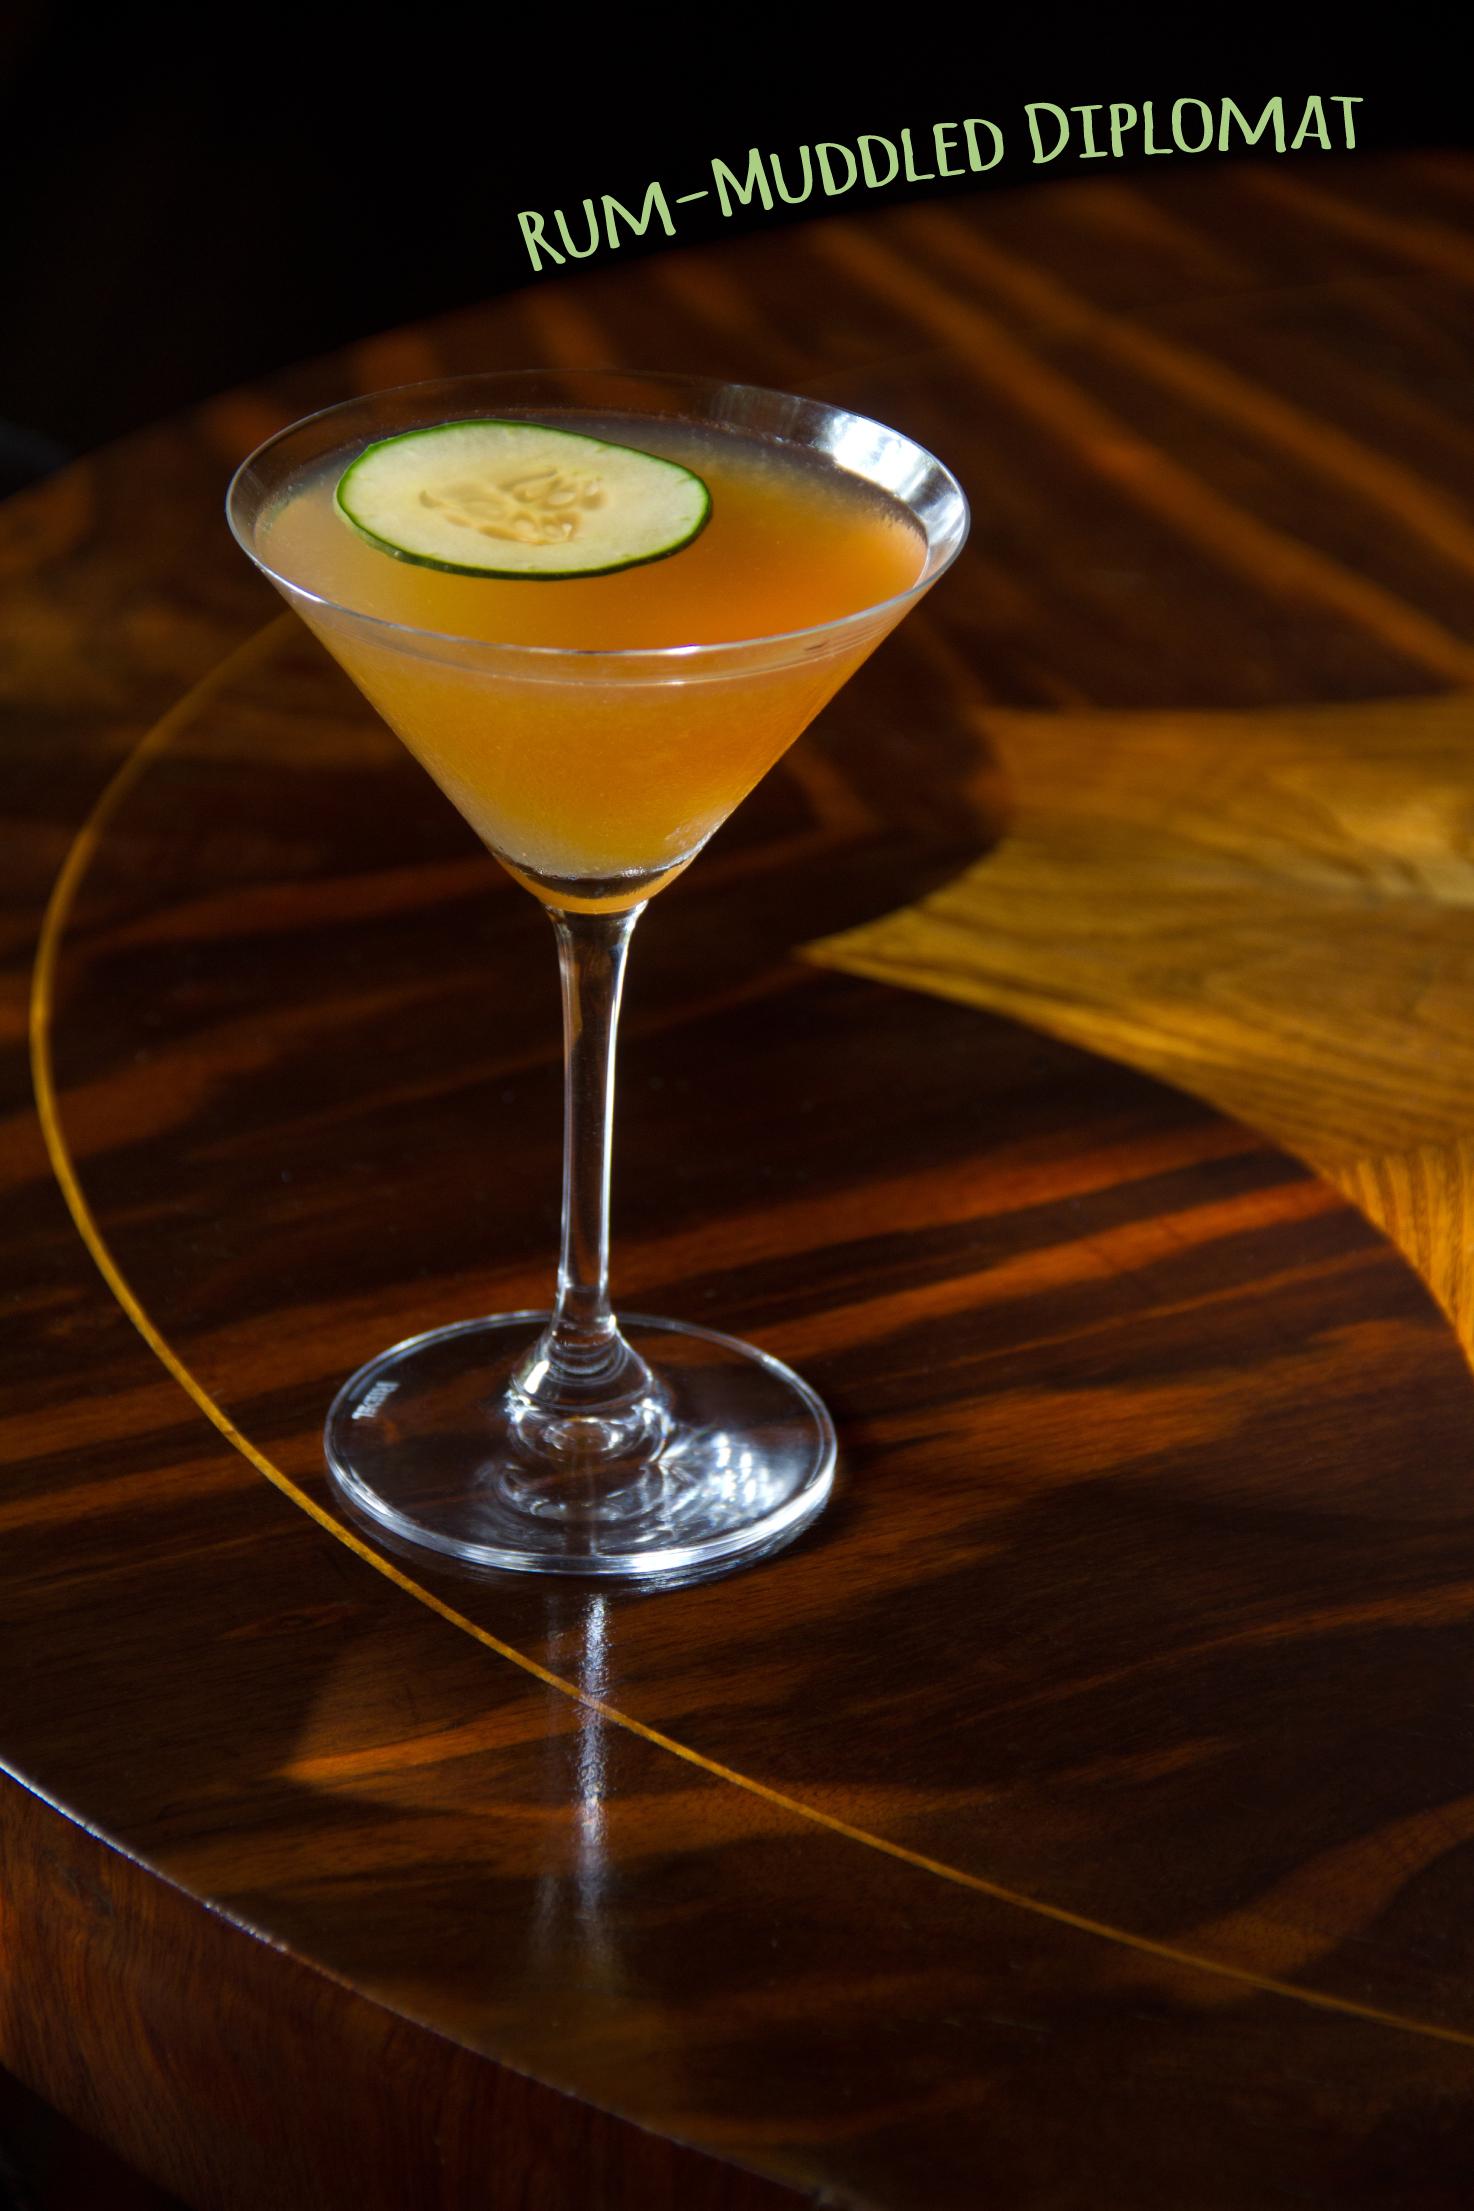 Rum-Muddled Diplomat